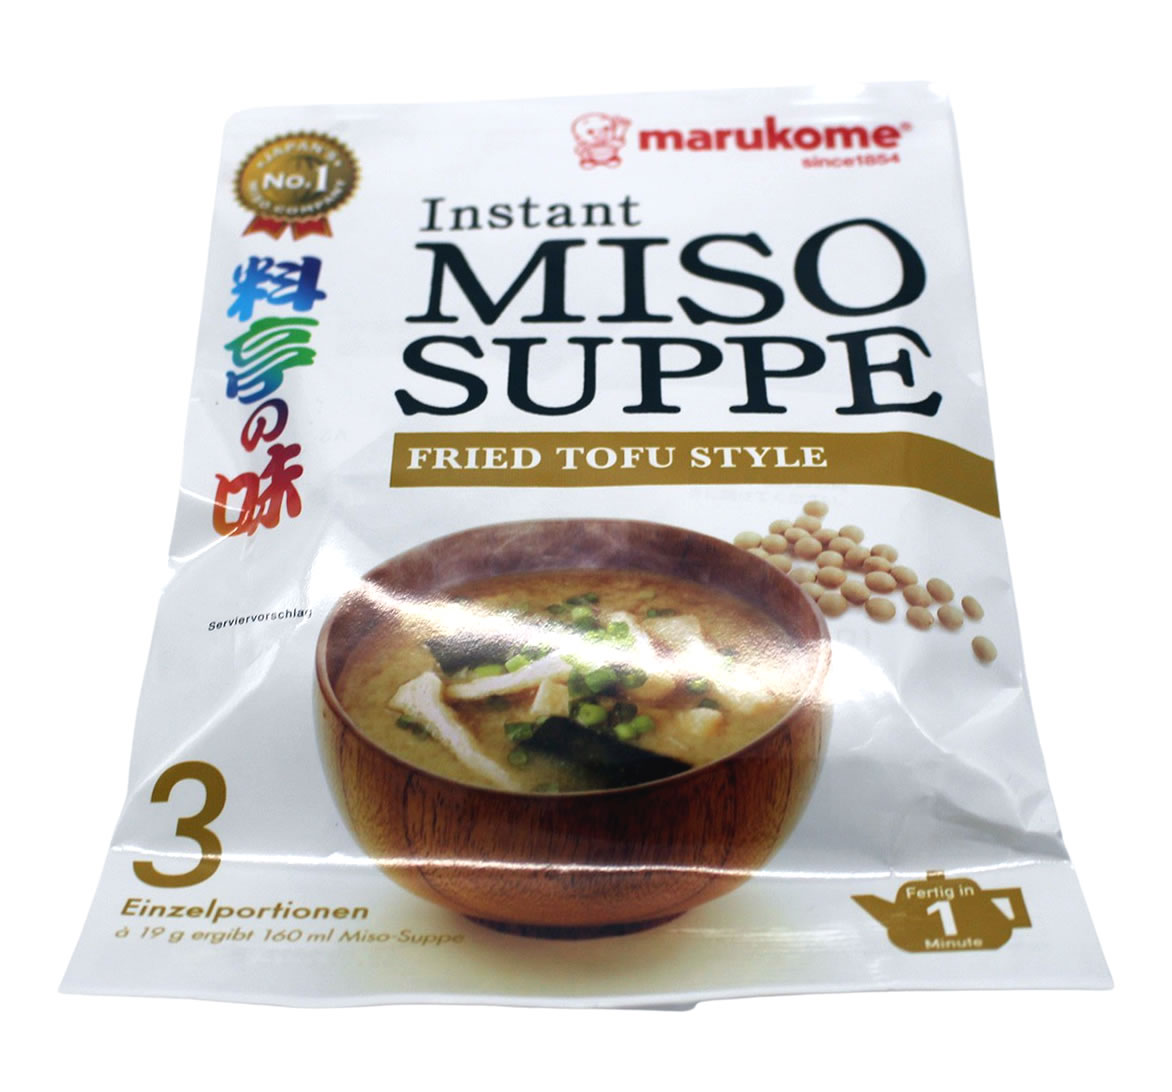 Marukome Instant Miso-Suppe mit gebratenem Tofu, 57 g